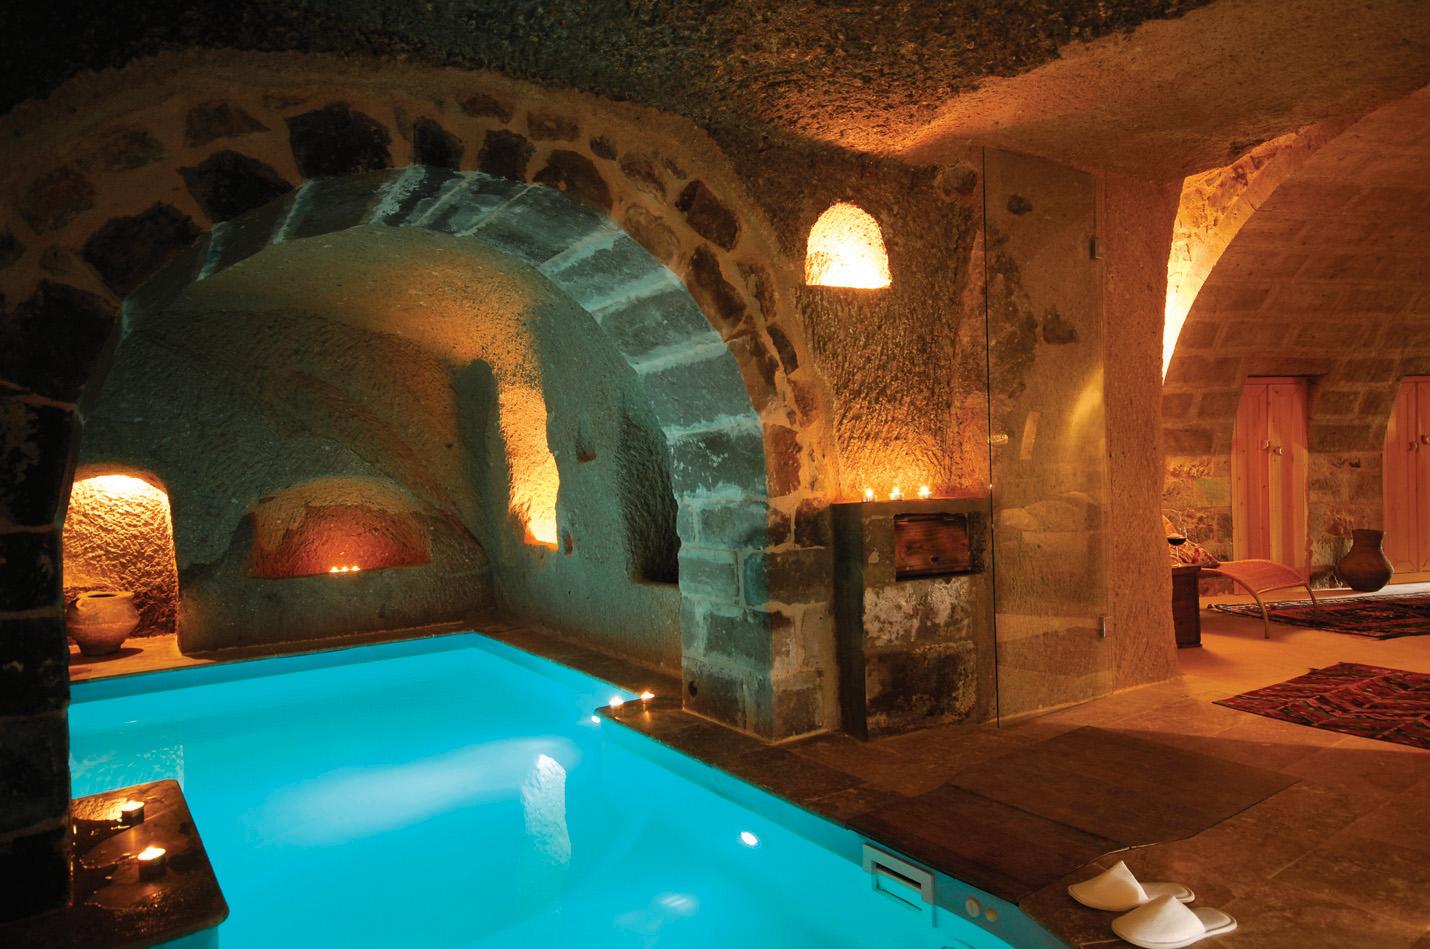 Cave Hotels Kitesnsights